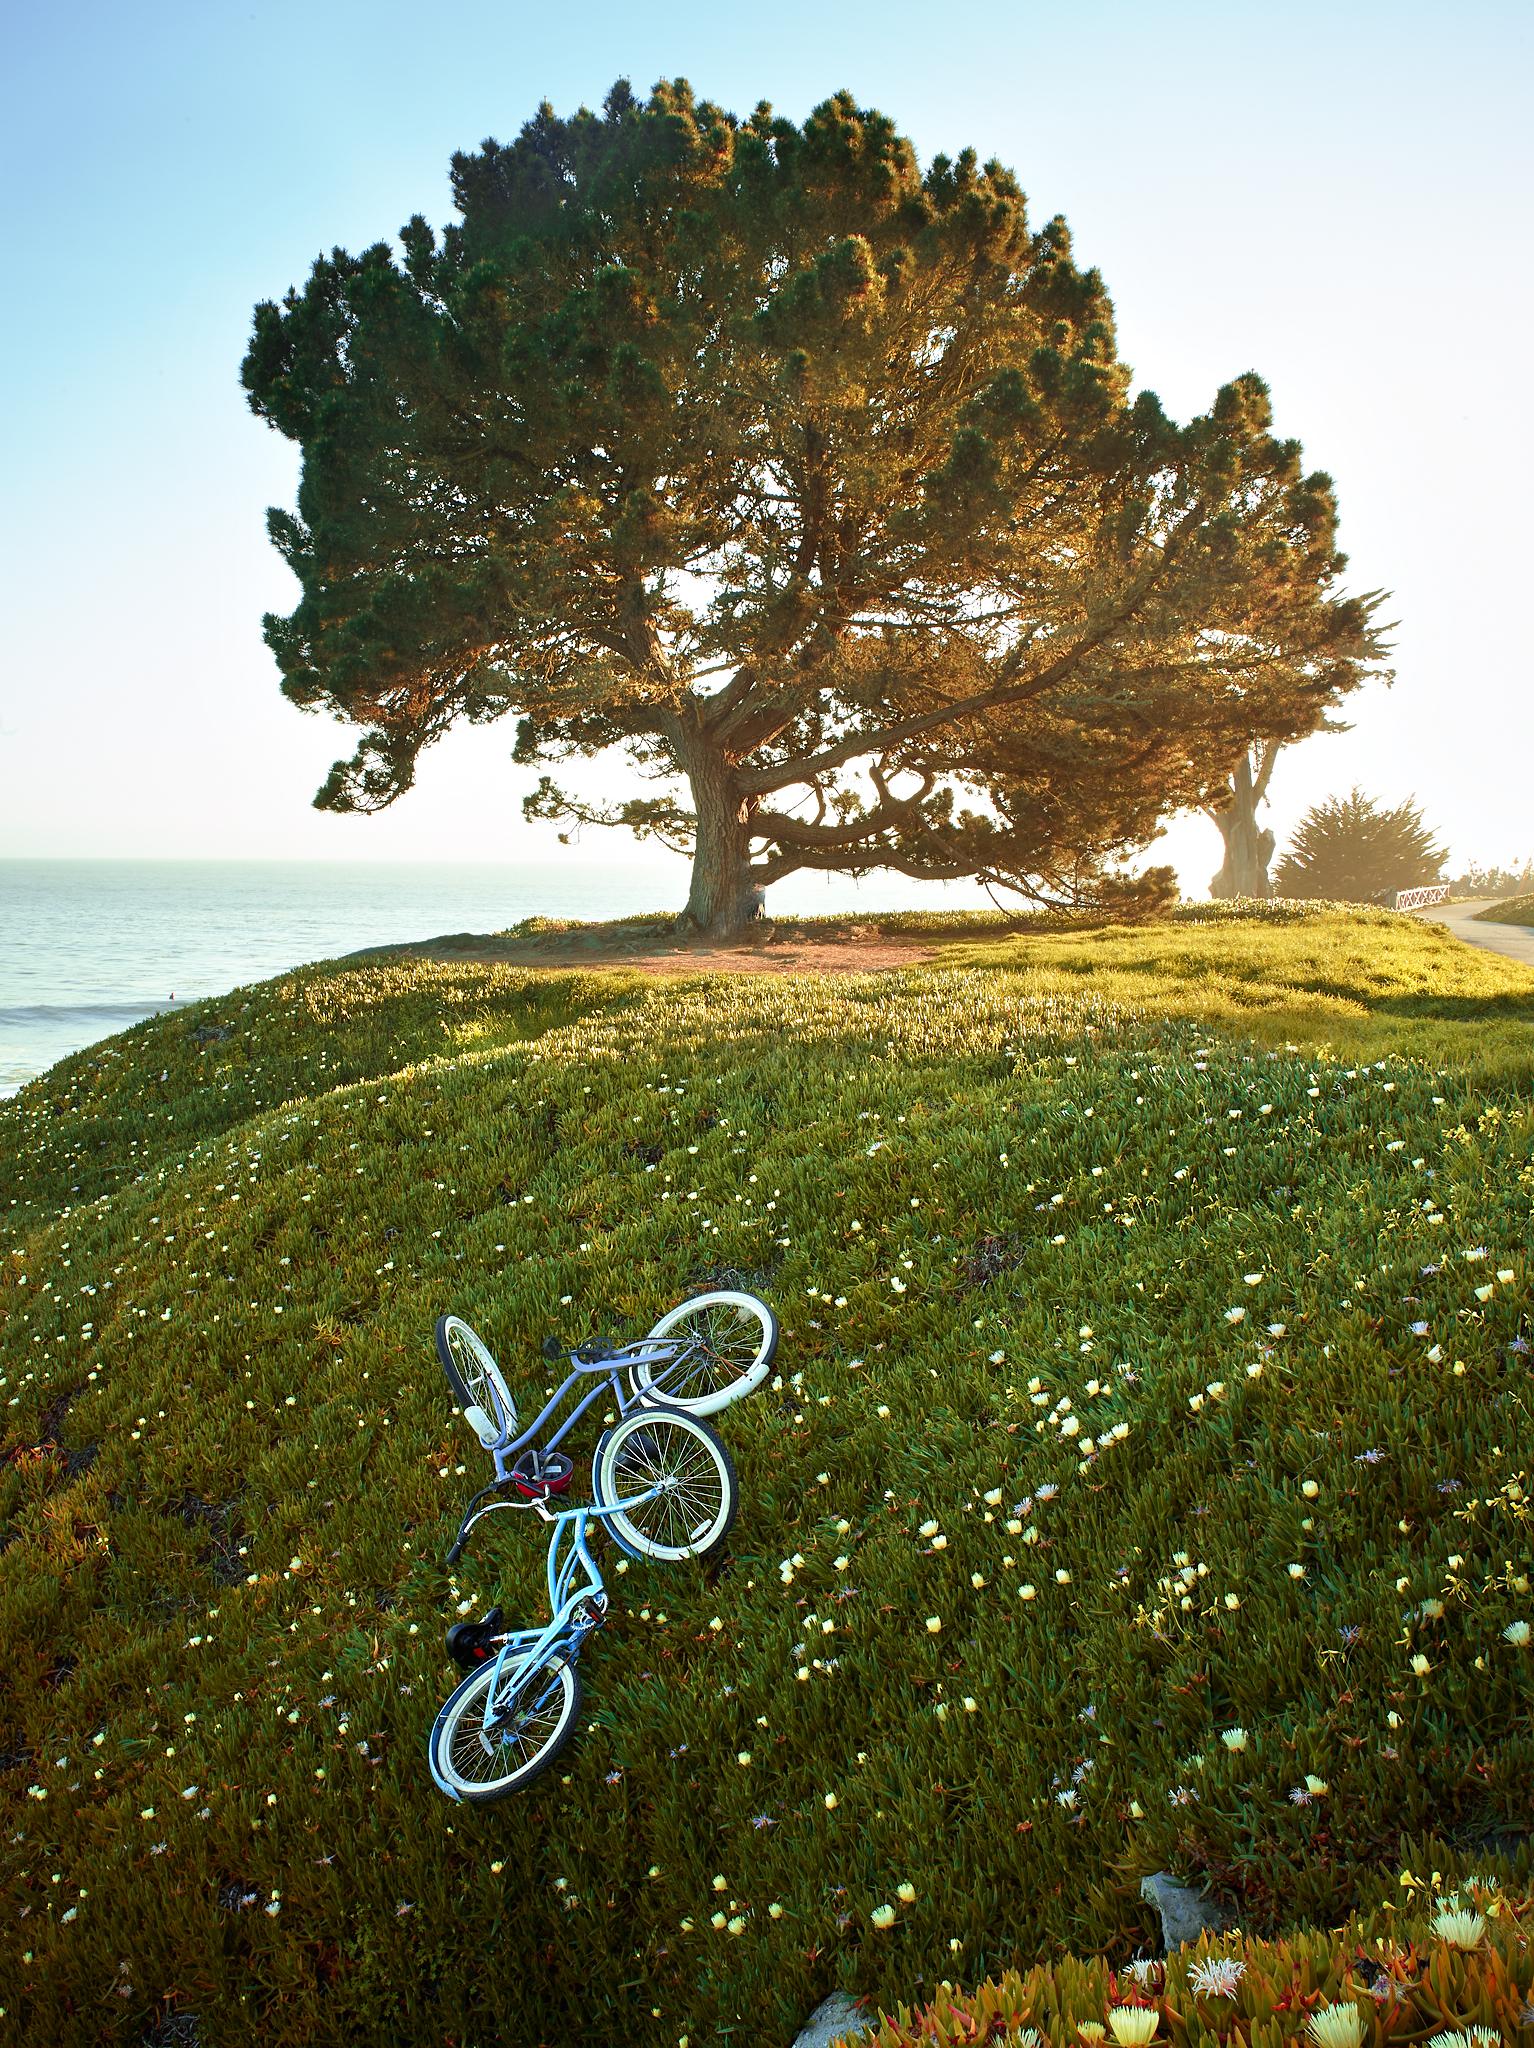 Beach Bicycles. Santa Cruz, Summer, flowers.